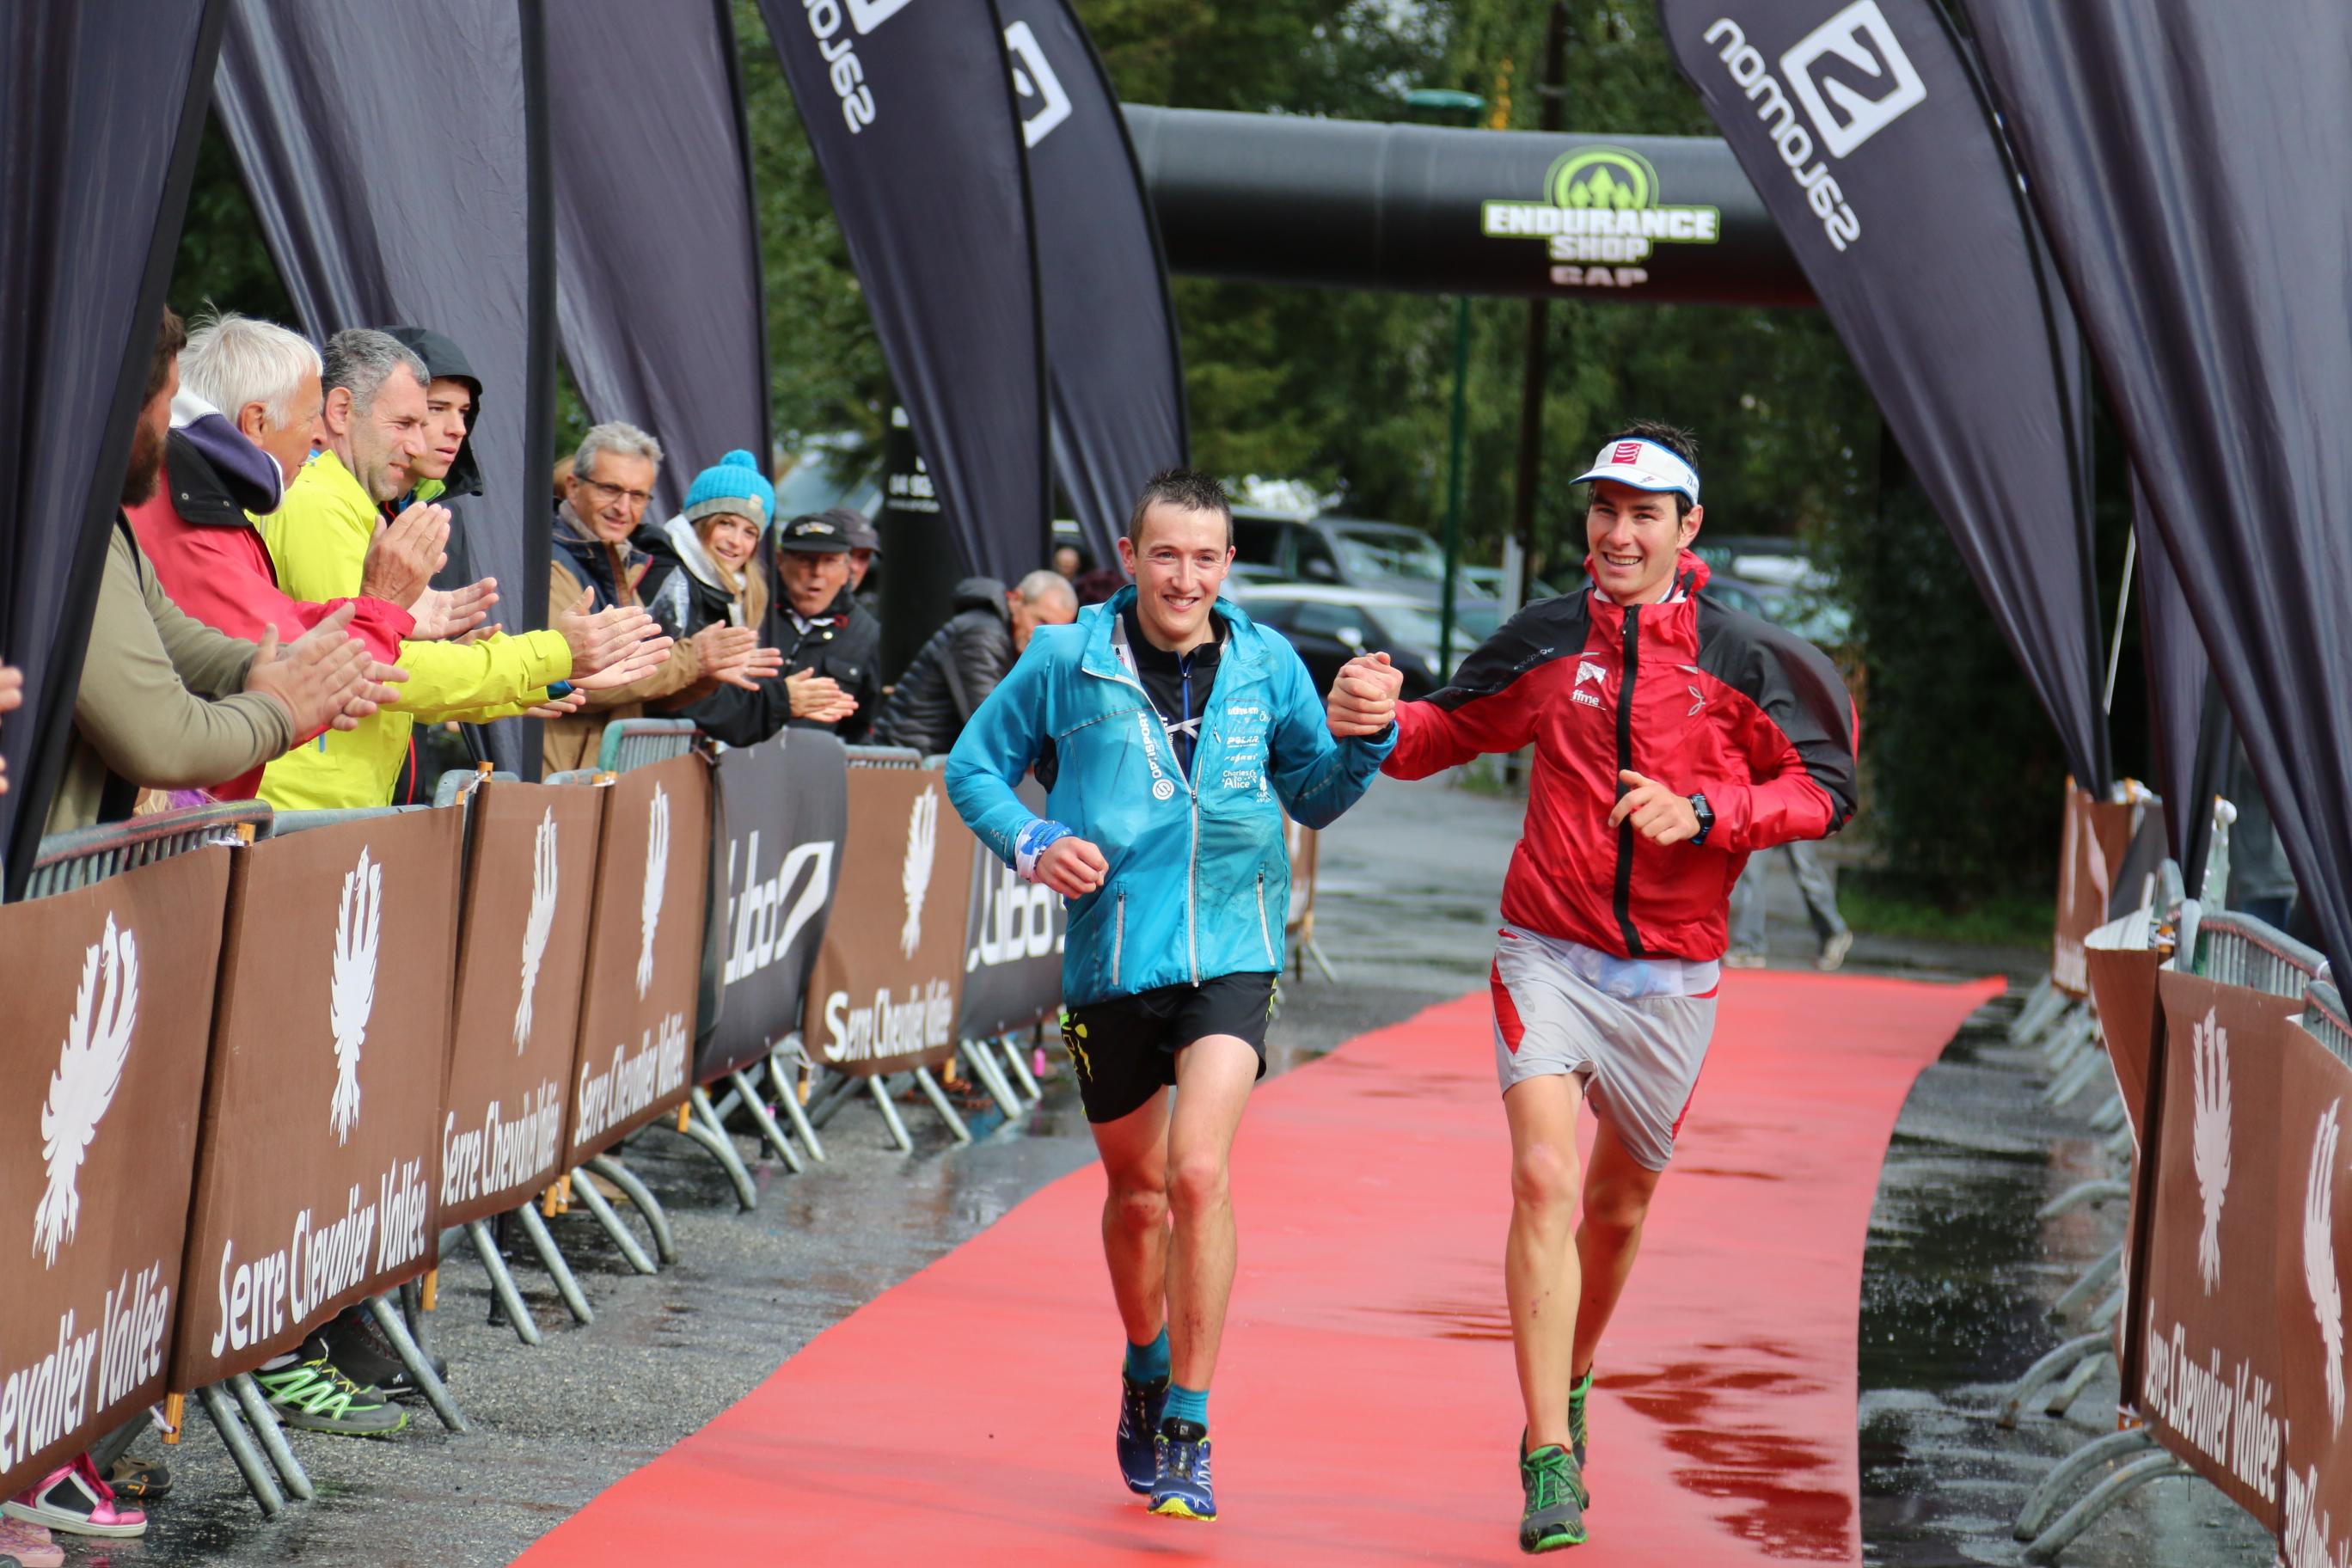 Résultat Serre che trail Salomon : victoire de Gael Reynaud